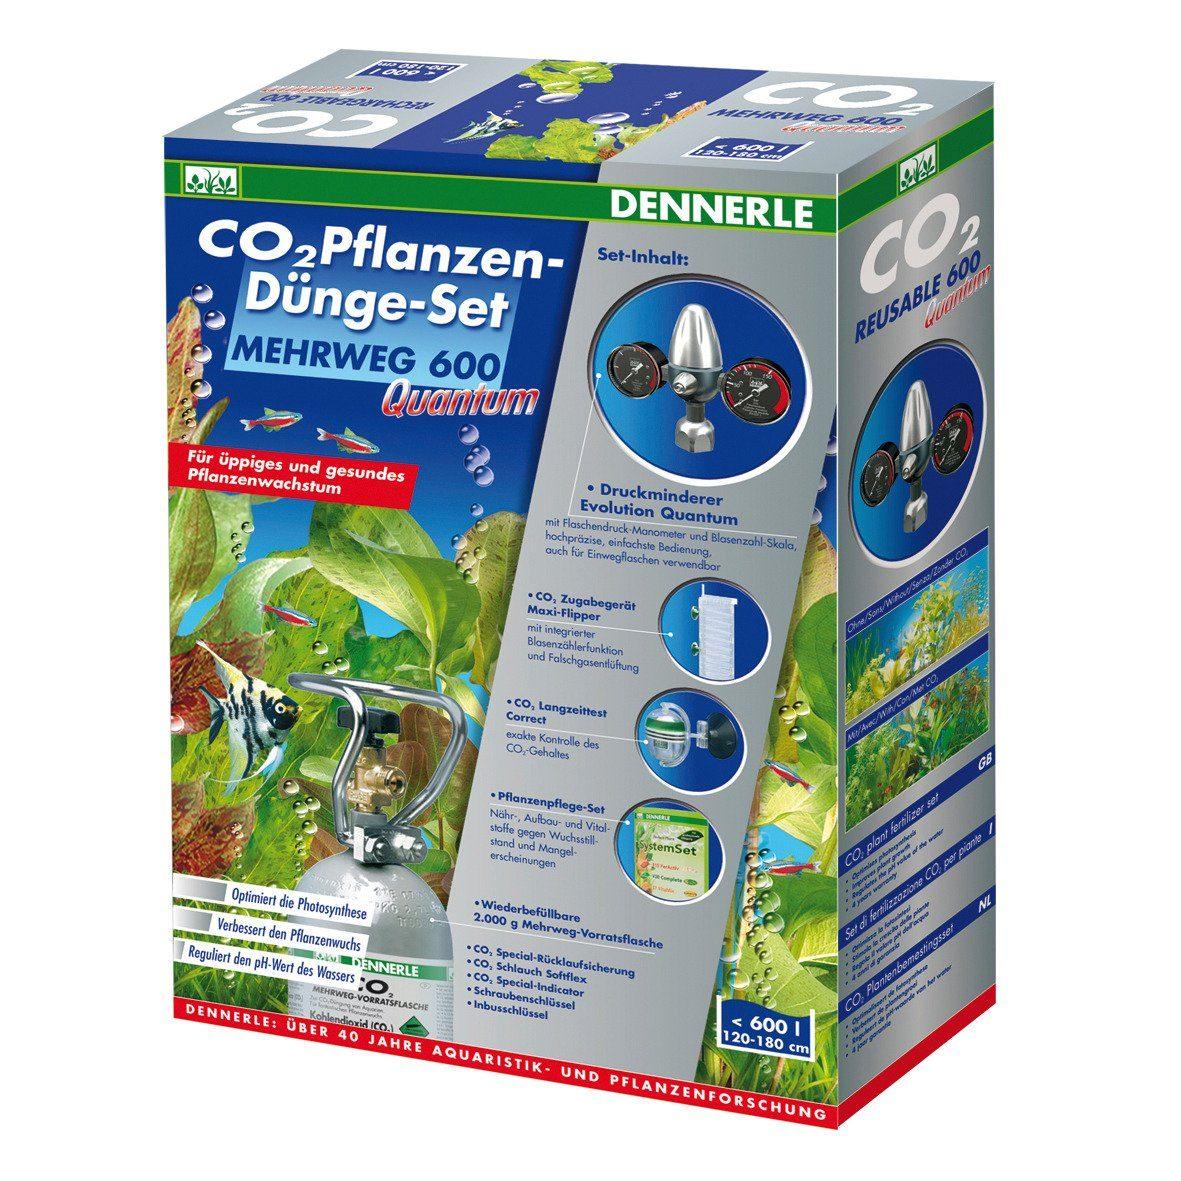 Dennerle Aquariumpflege »CO2 Pflanzen-Dünge-Set MEHRWEG 600 Quantum«